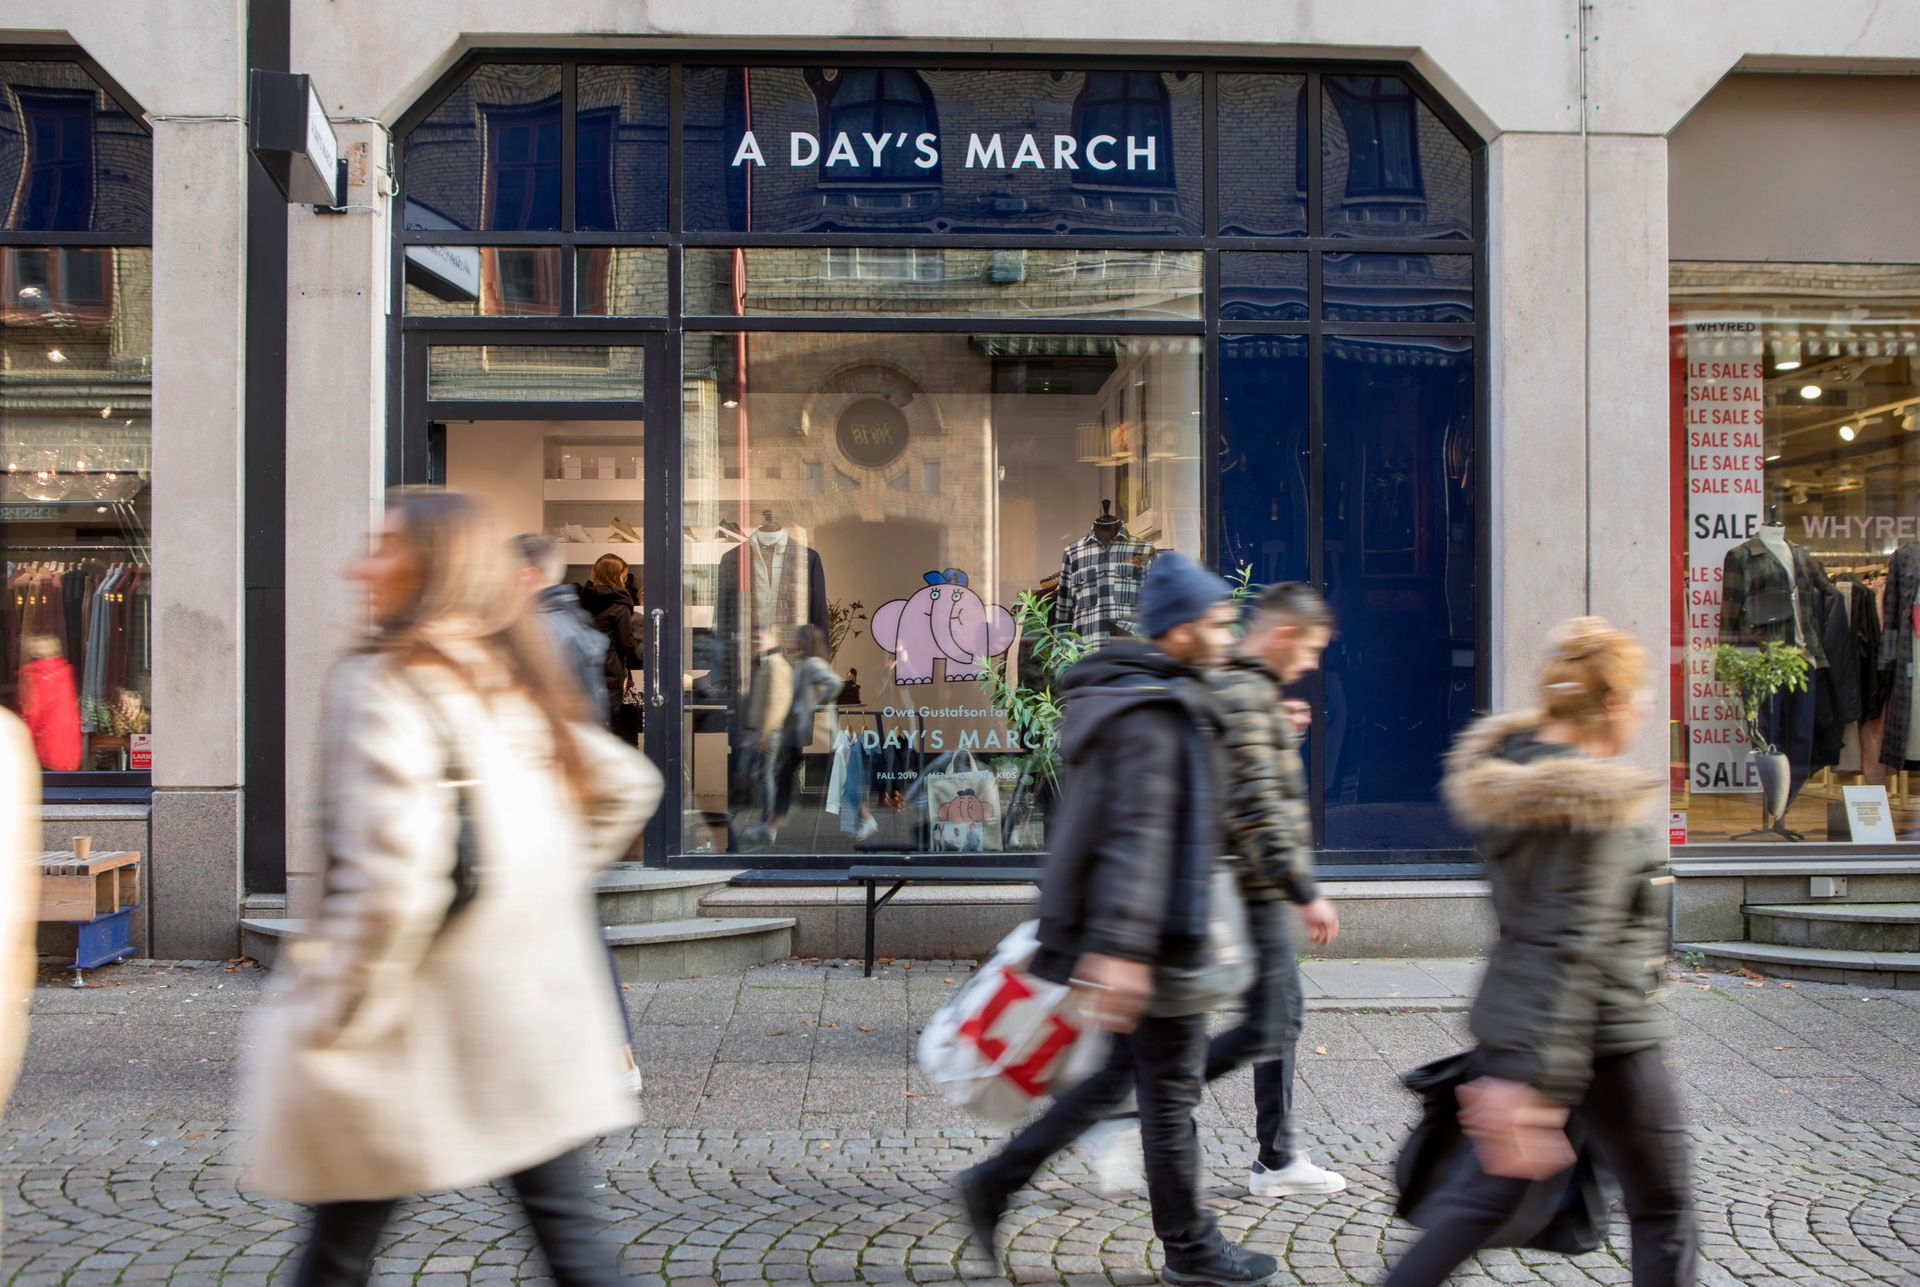 Several people seen blurry walking on a pedestrian shopping street.